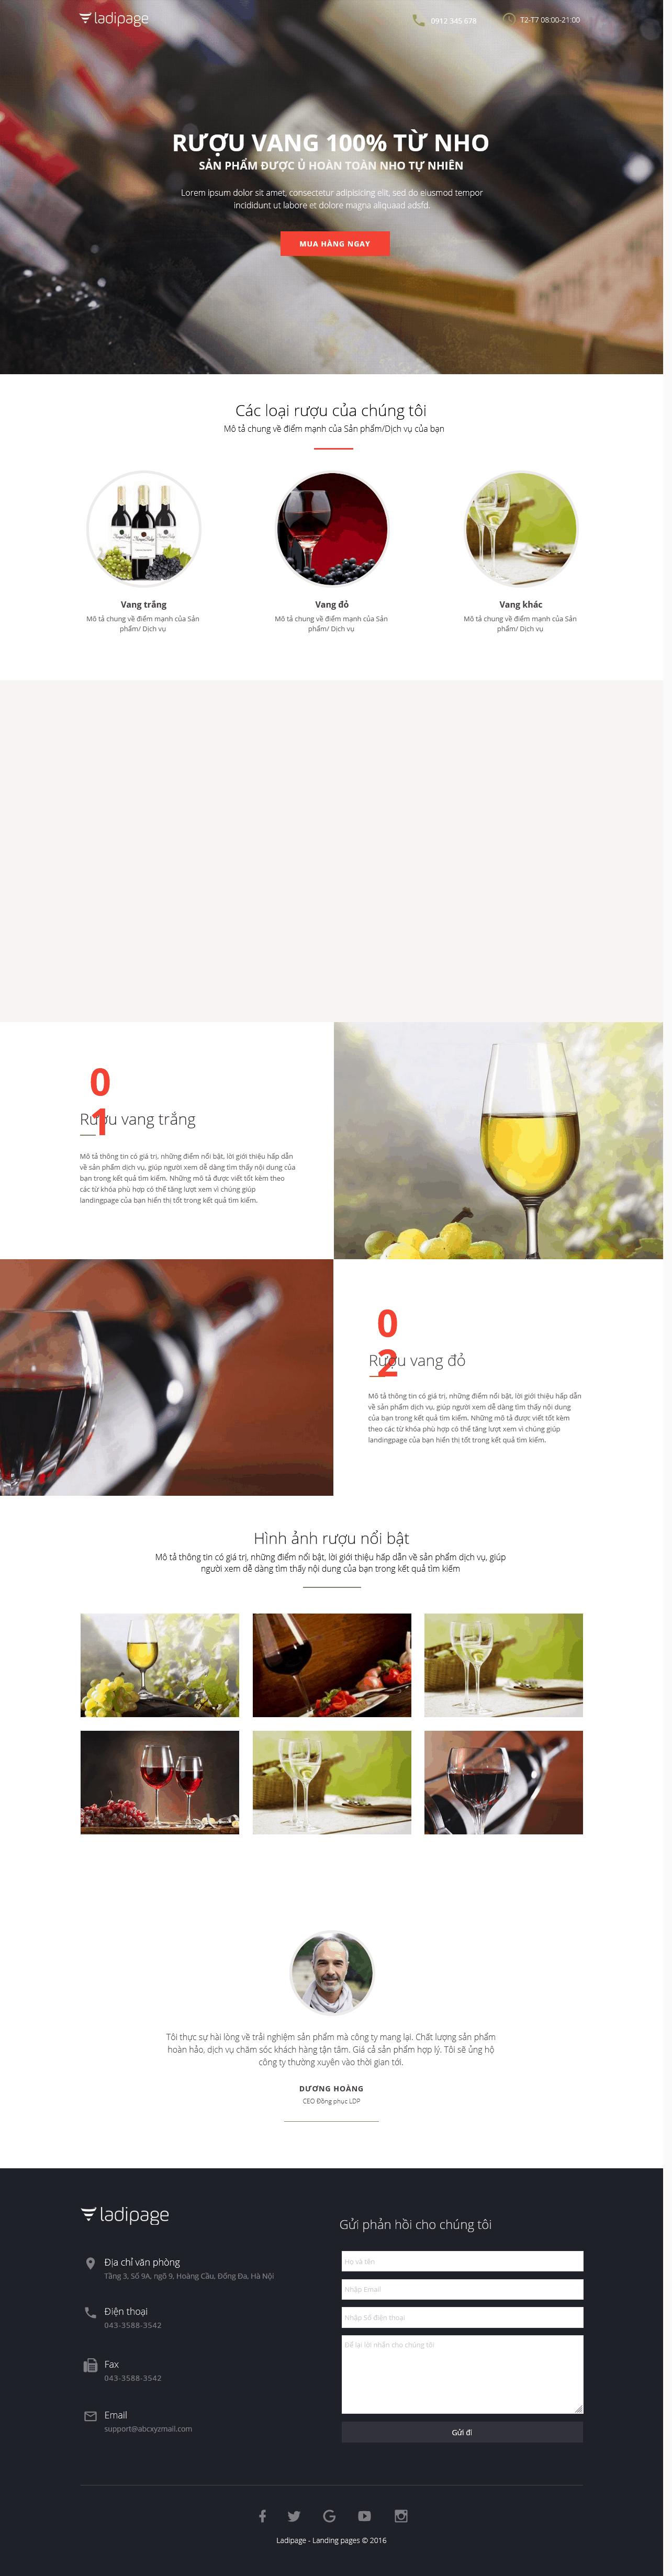 Thiết kế website Thiết kế webiste landingpage gioi-thieu-thuong-hieu---cong-ty Shop bán hàng 02